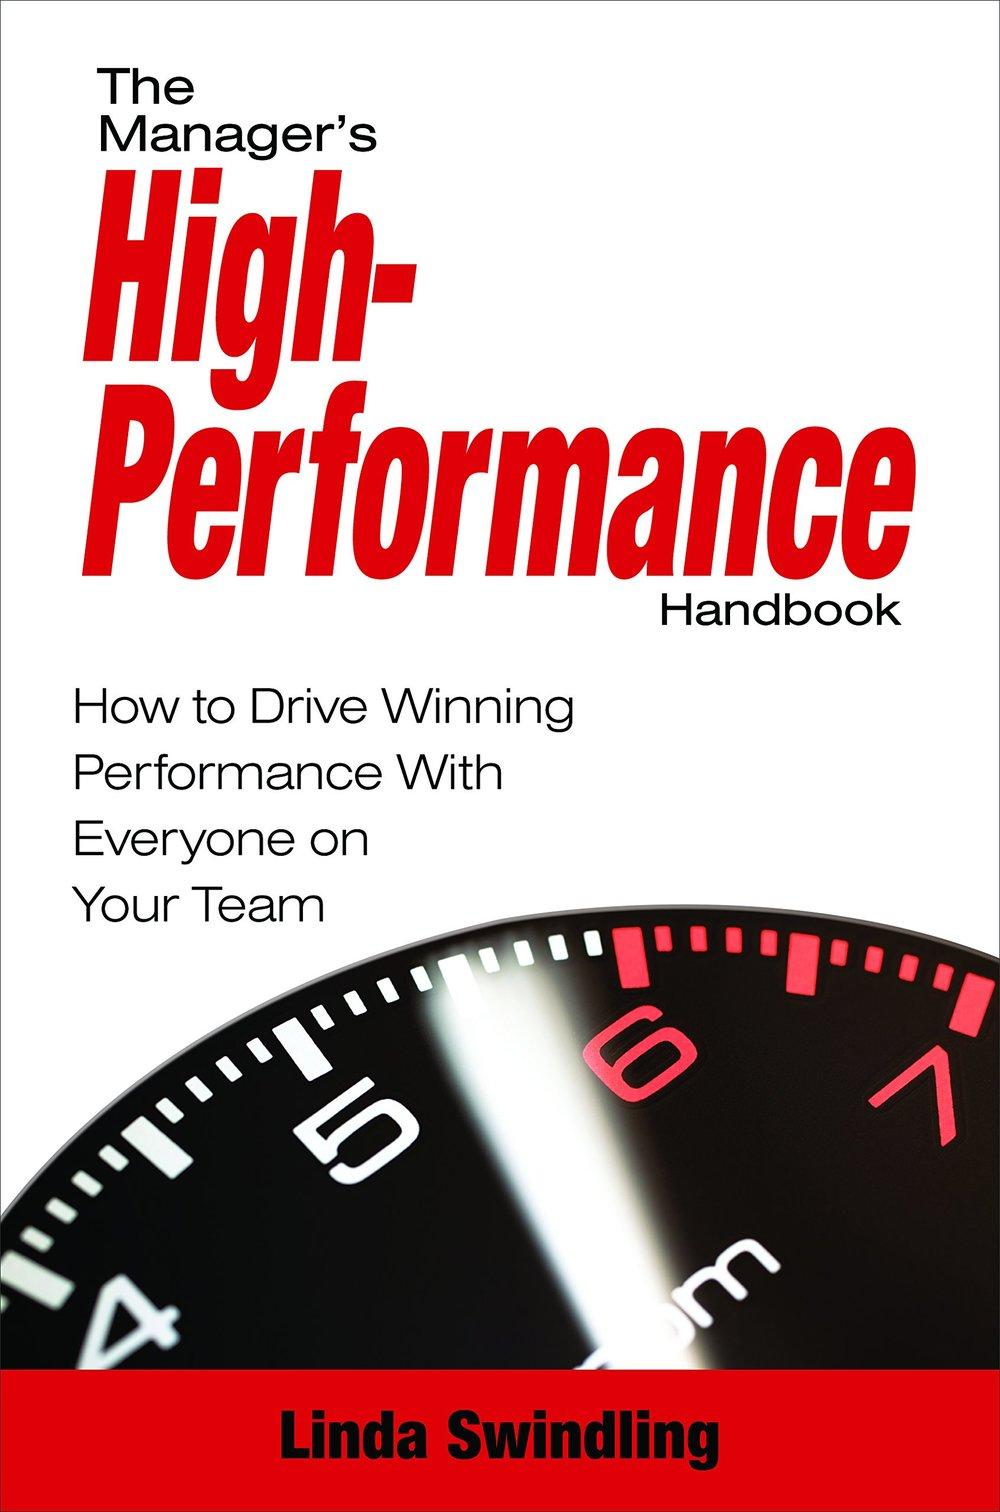 Managers High Performance Handbook Linda Swindling Book Cover.jpg